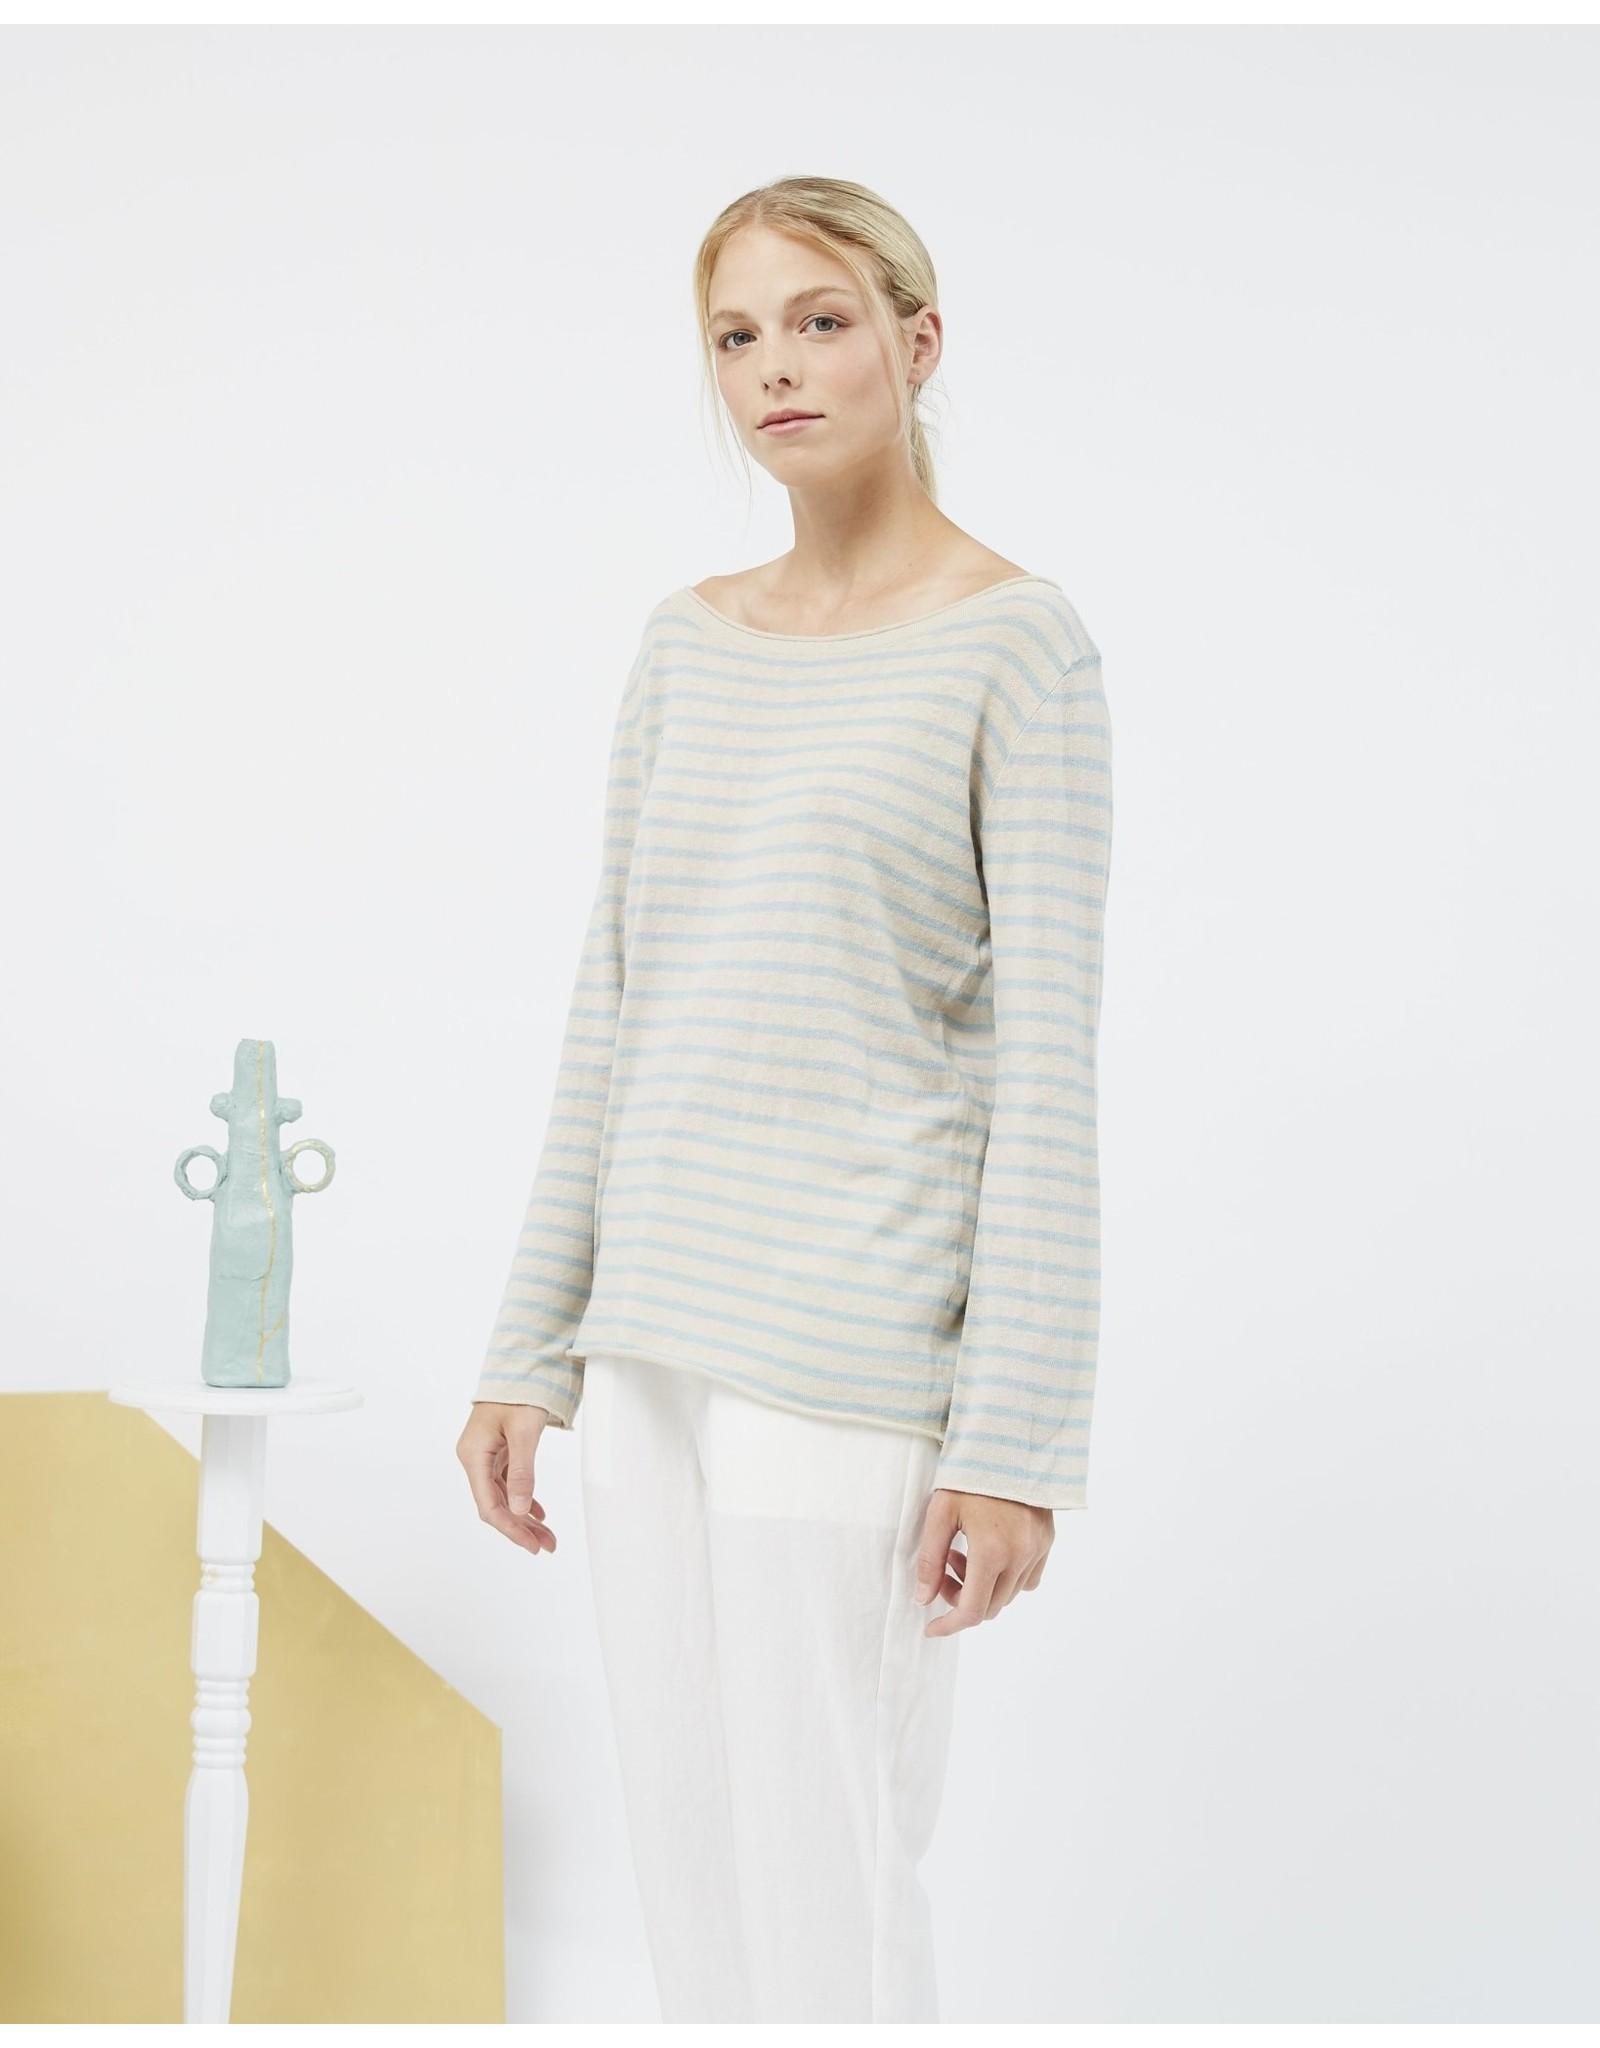 Naif Eve Sweater